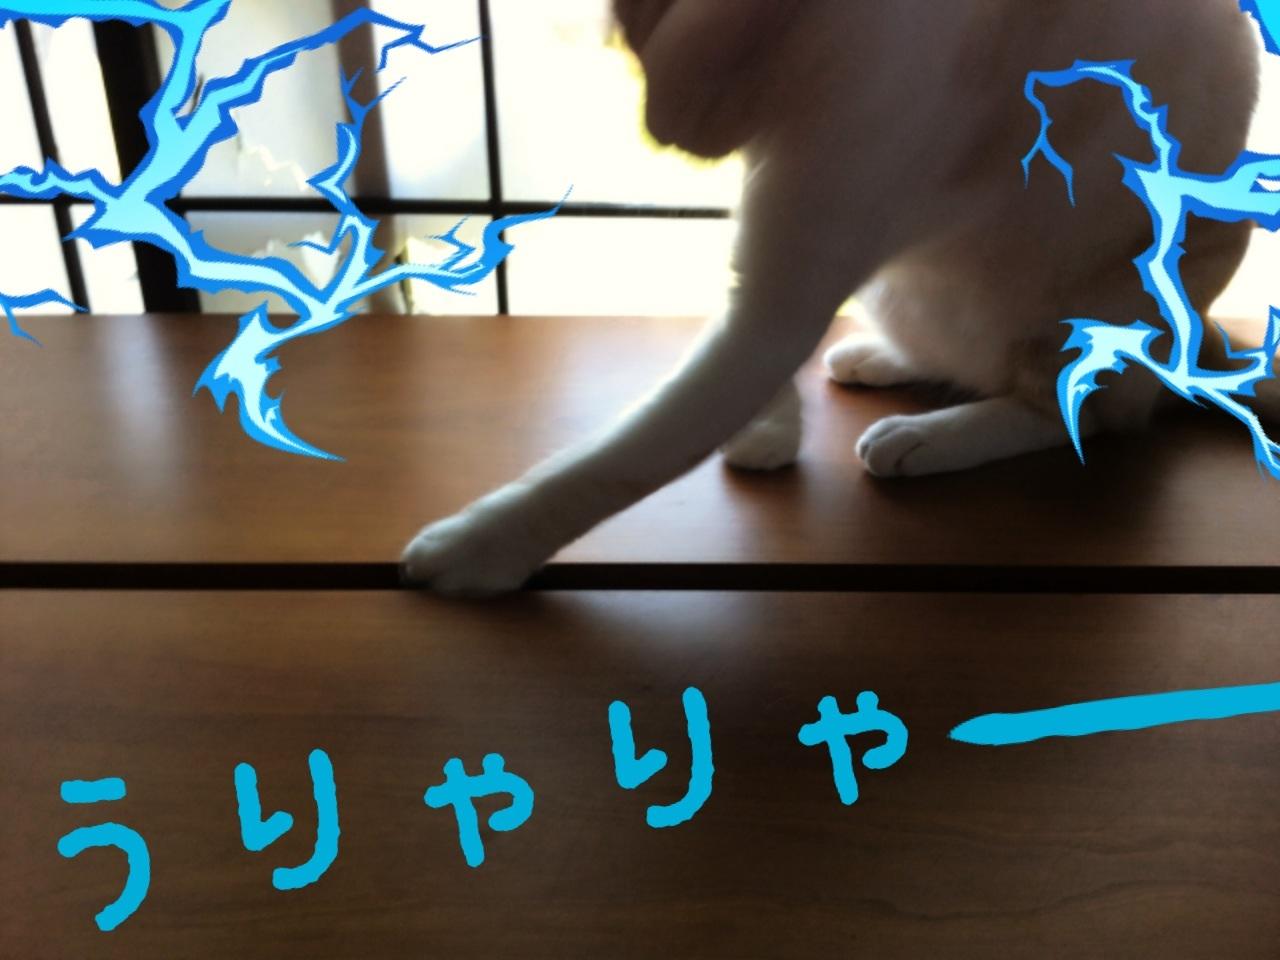 image_20130708200715.jpg